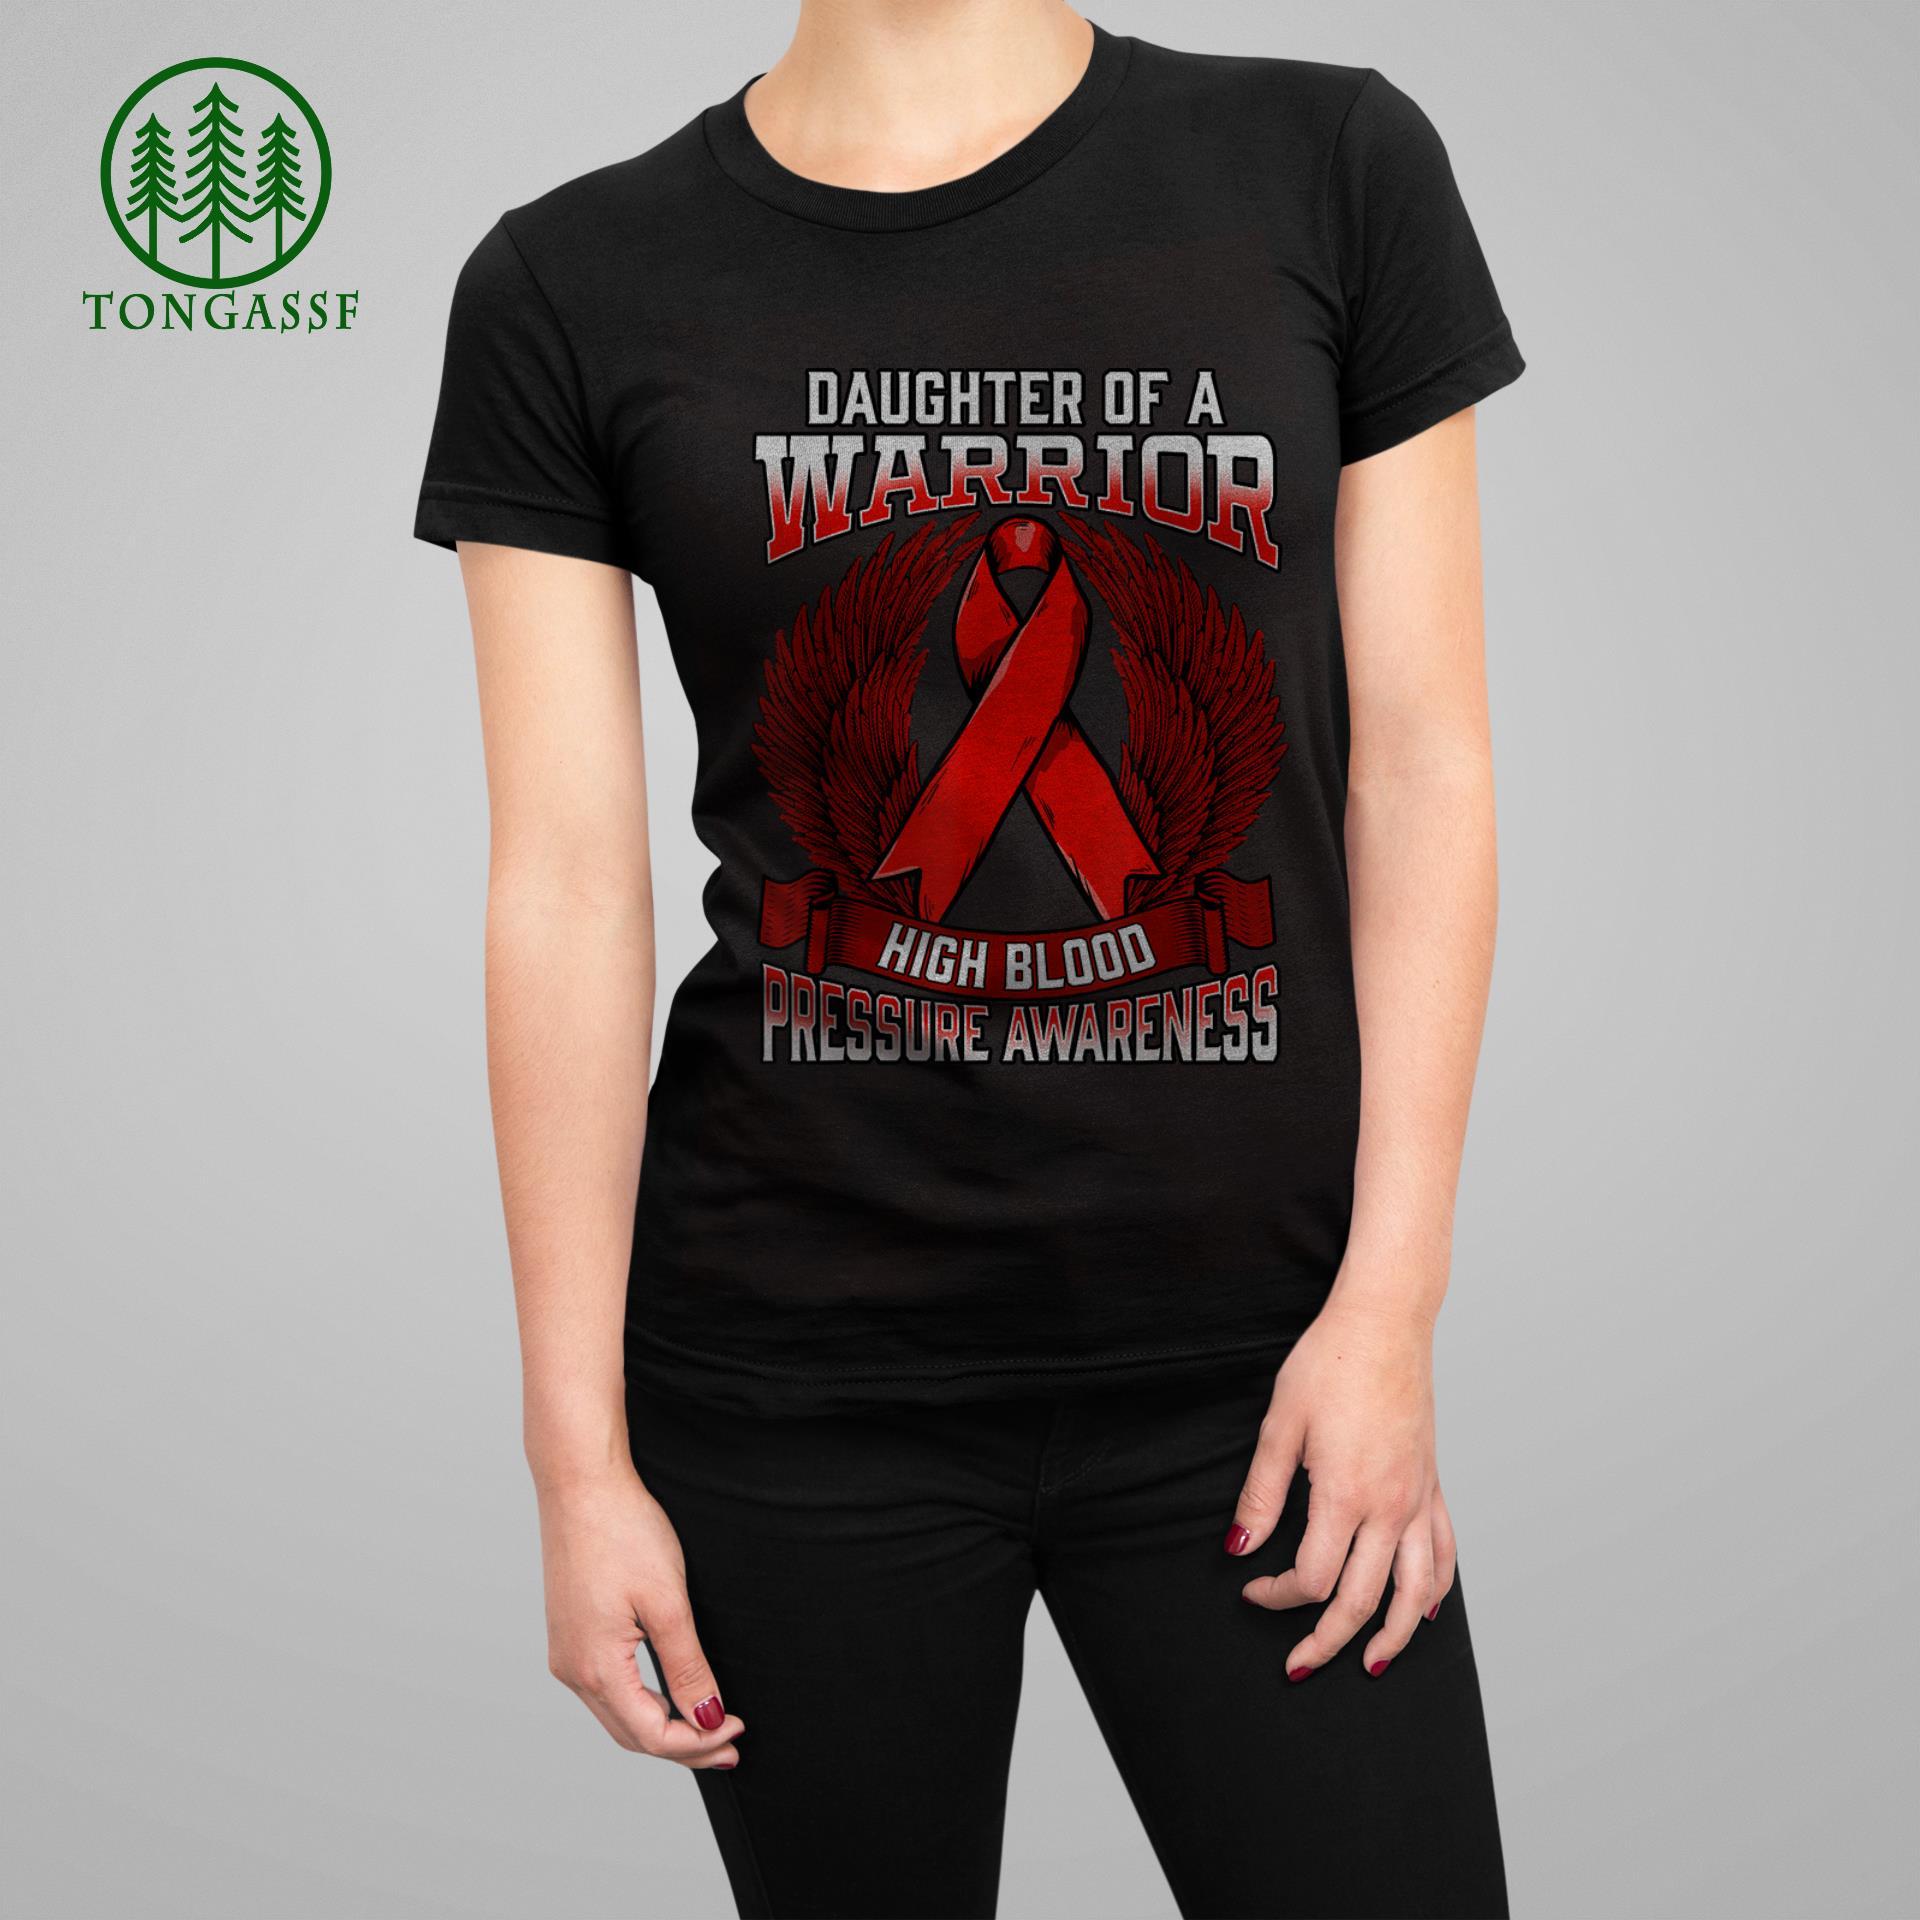 High Blood Pressure Awareness Daughter Support Ribbon T Shirt